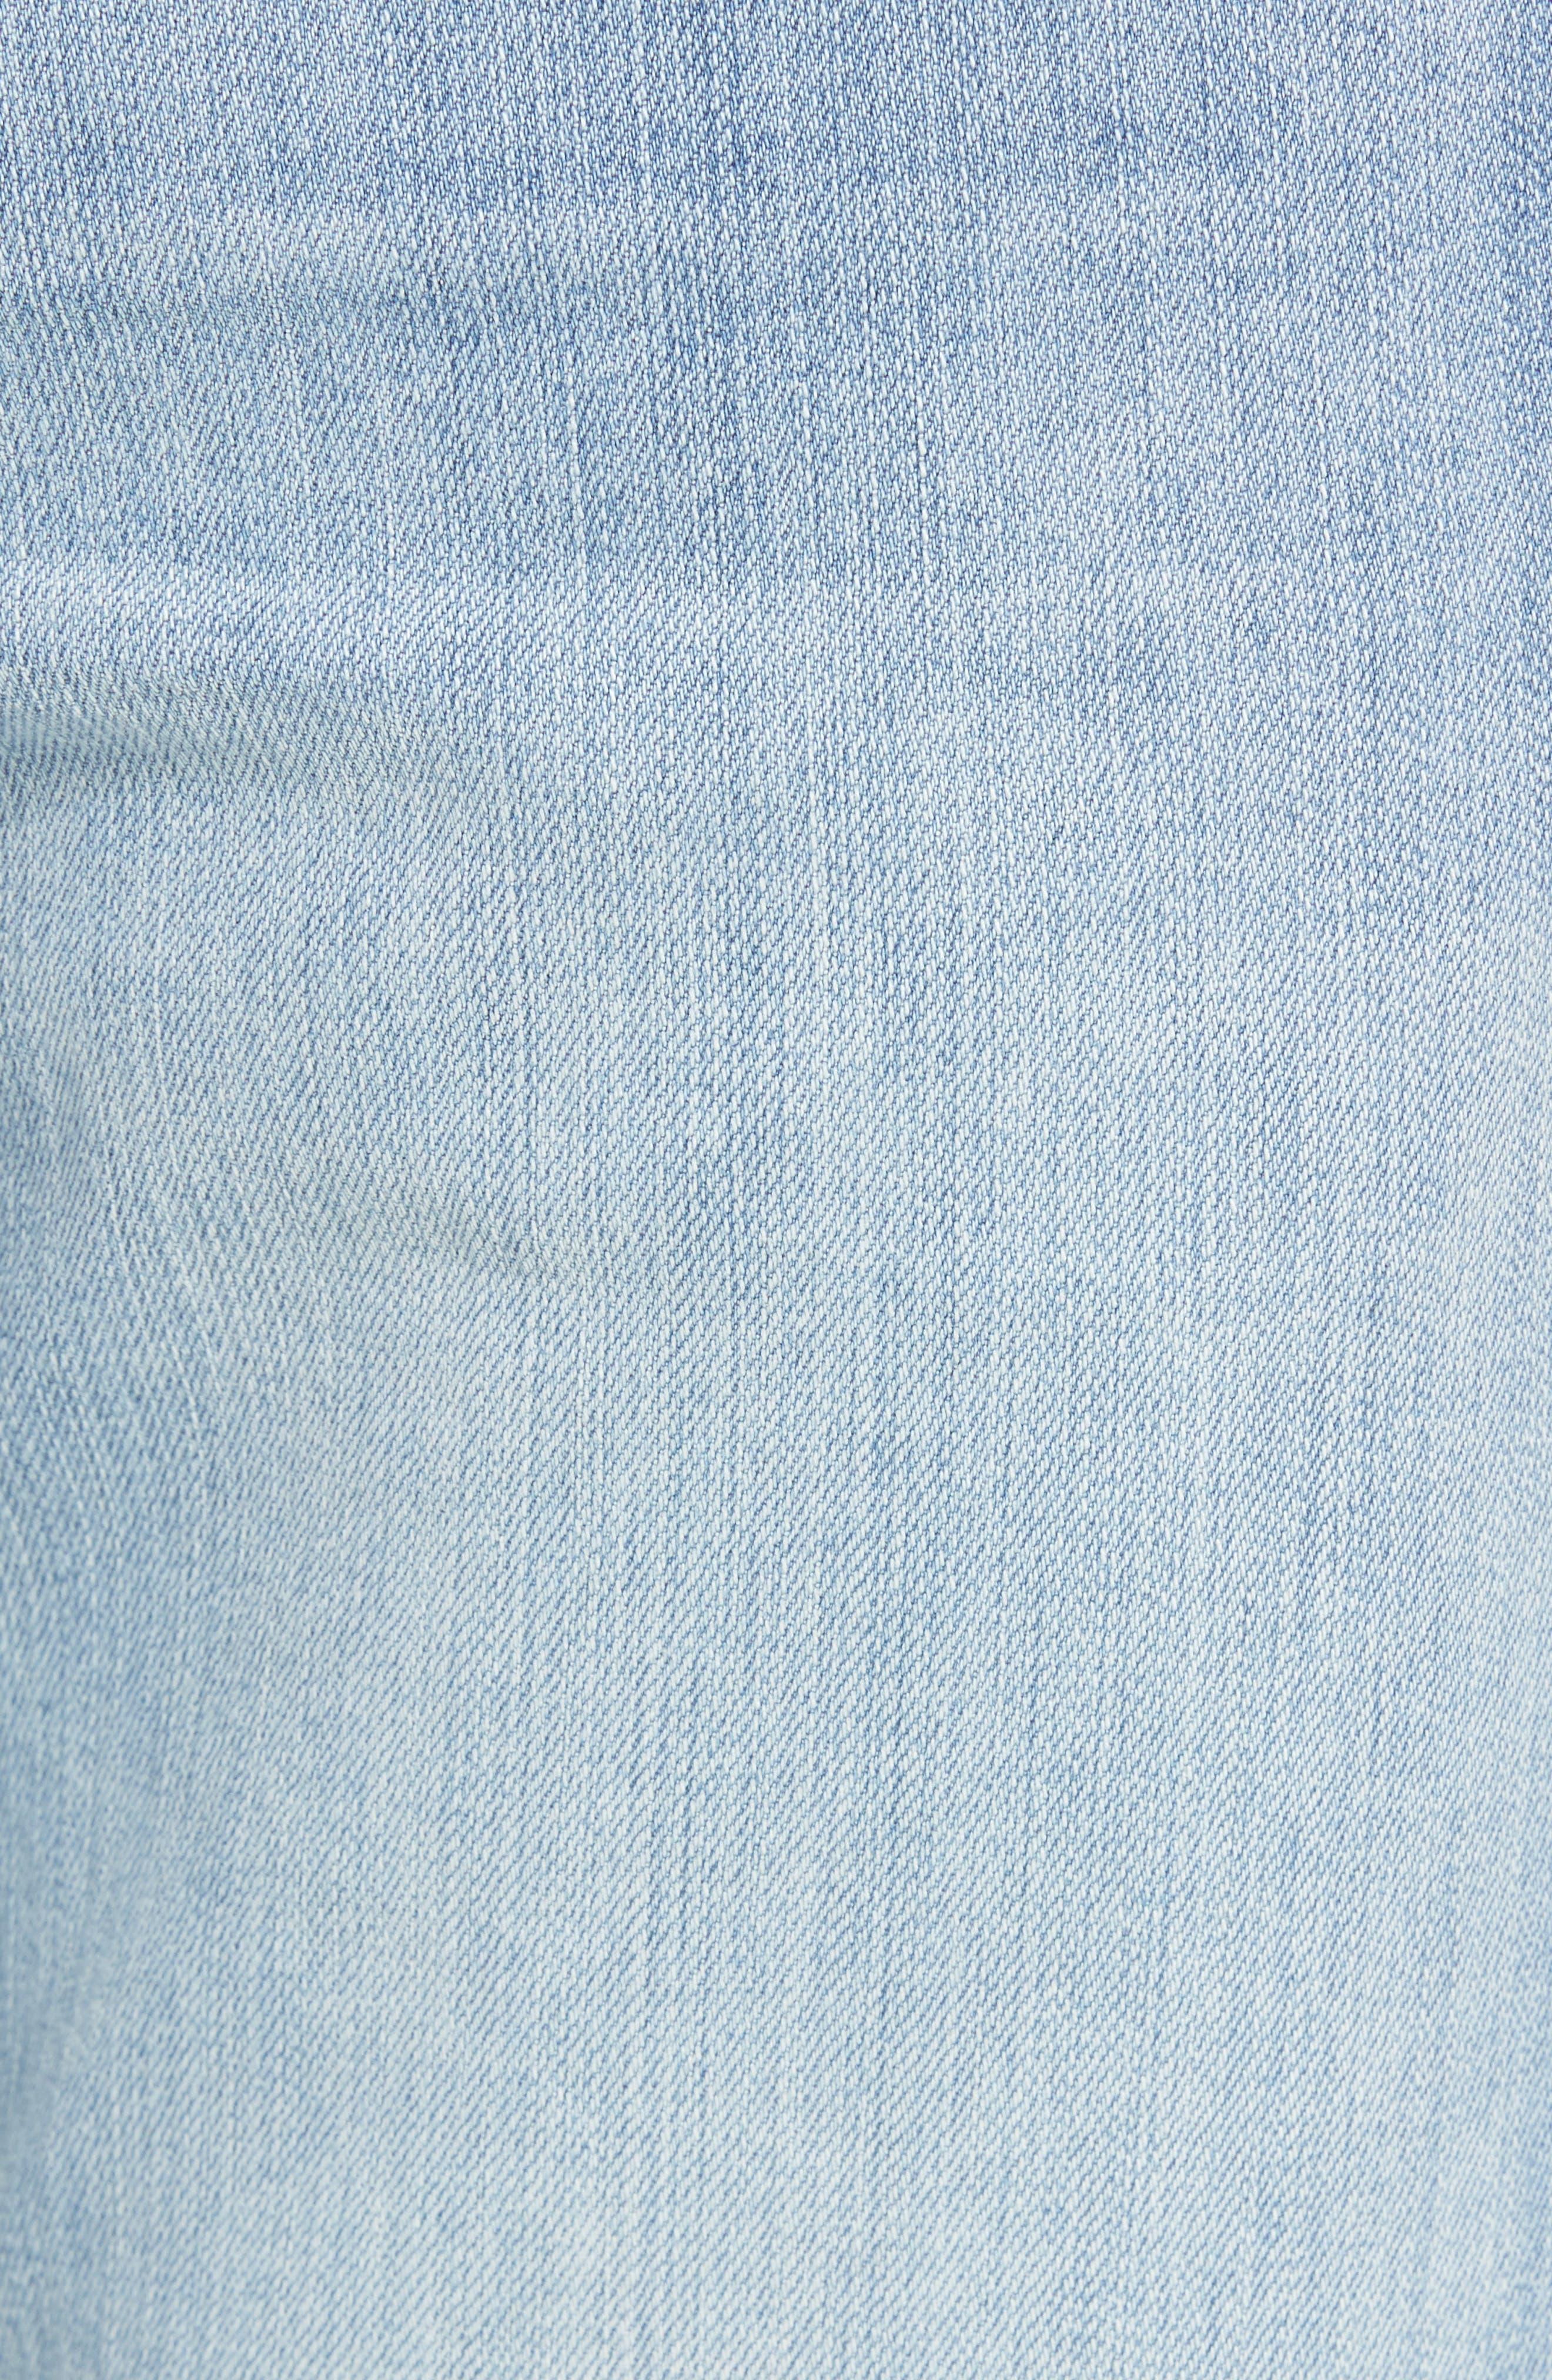 Lennox Slim Fit Jeans,                             Alternate thumbnail 3, color,                             County Destructed